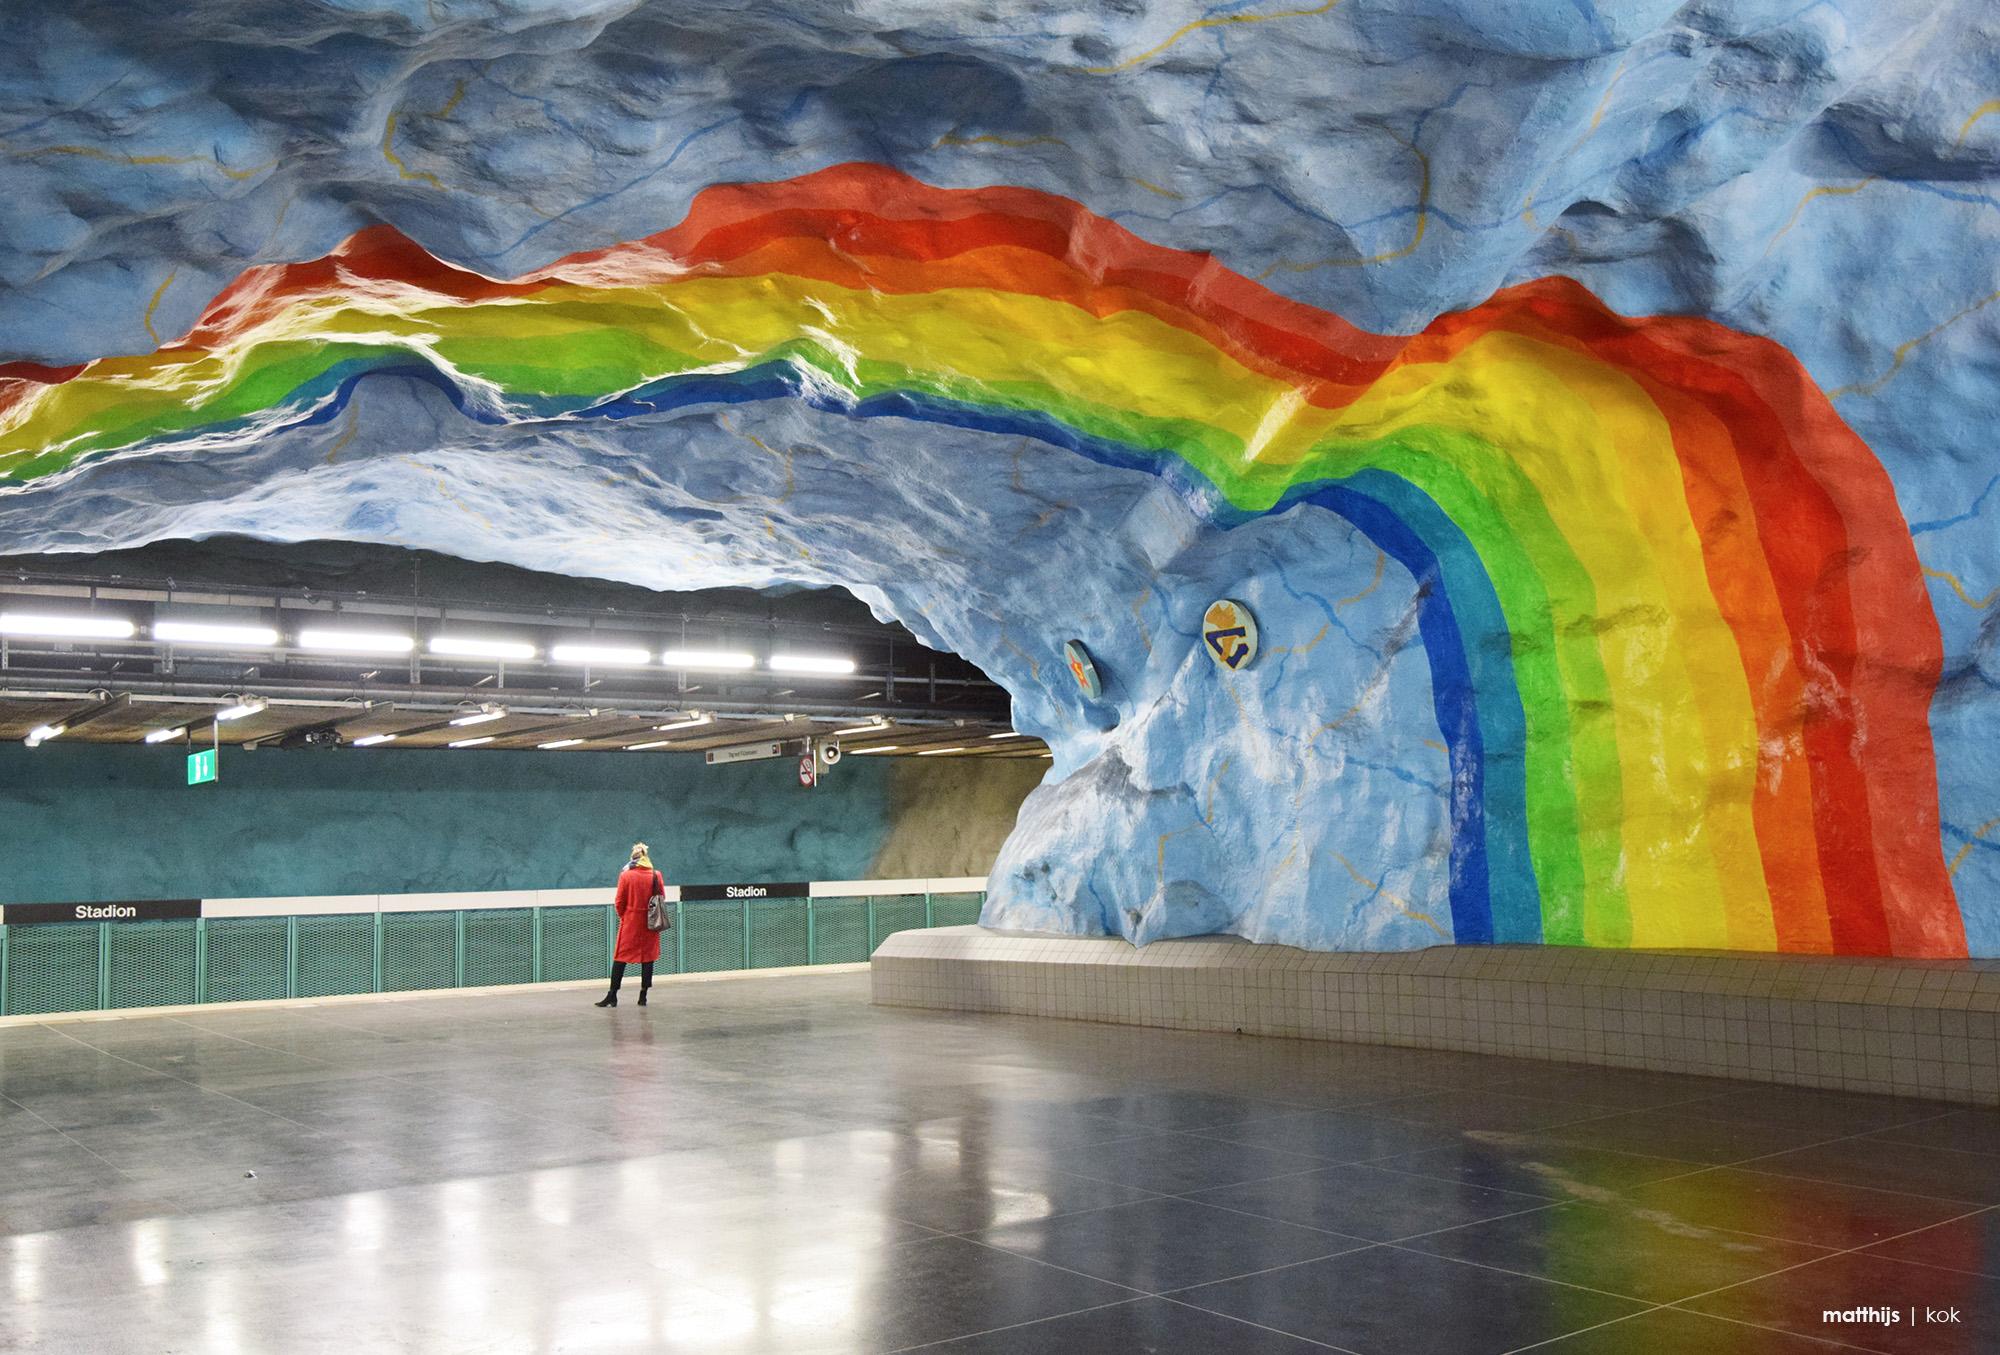 Stadion Subway Station, Stockholm, Sweden | Photo by Matthijs Kok